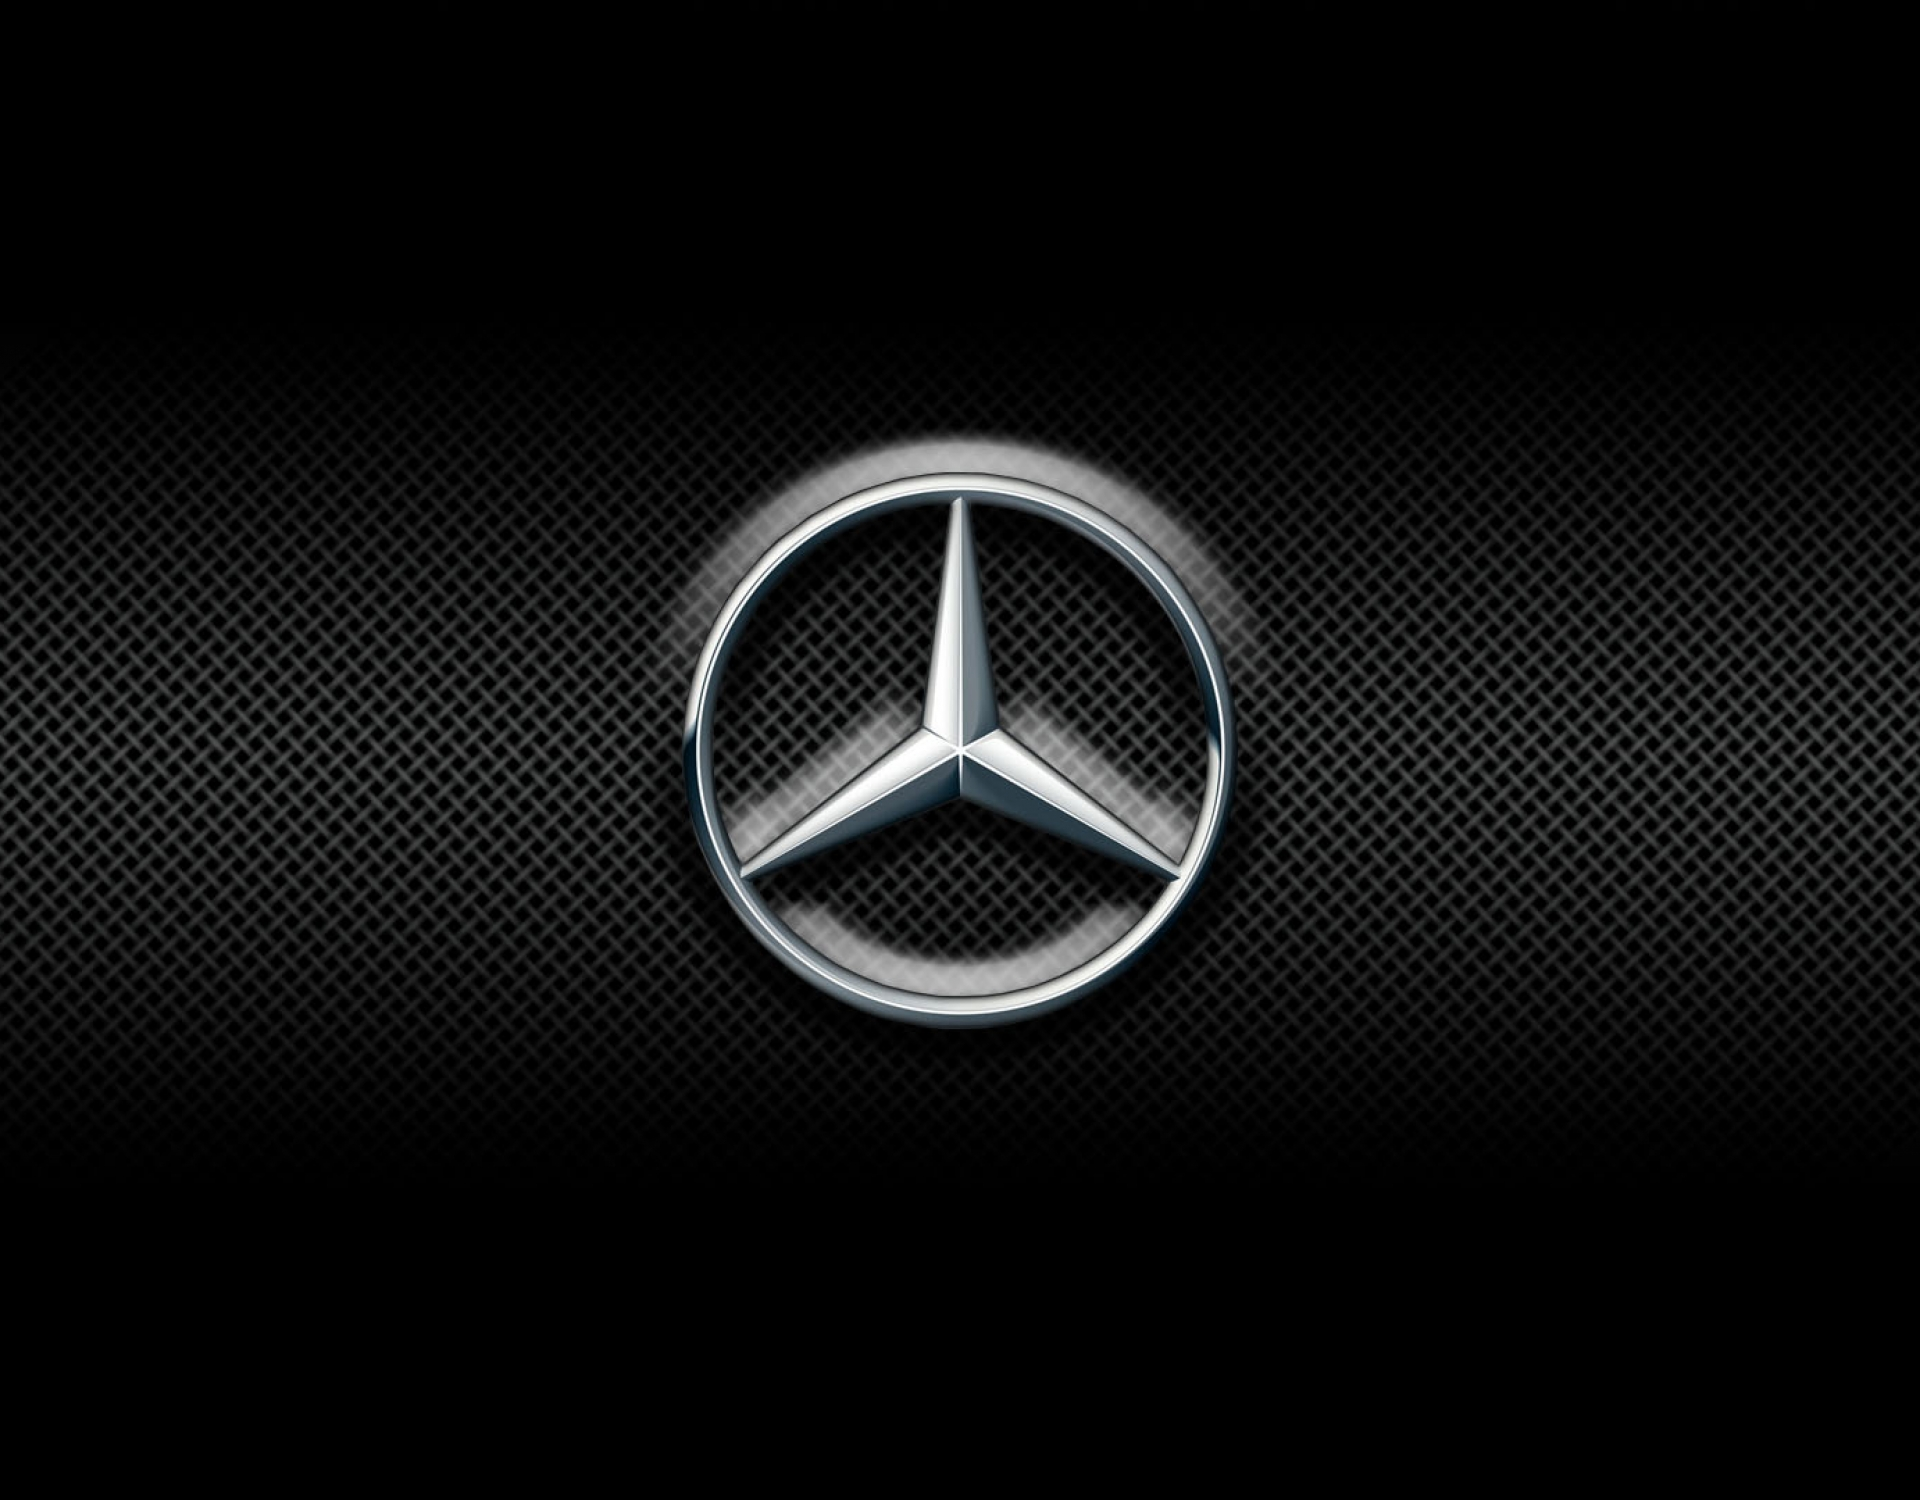 Mercedes Benz Wallpaper 38 1920x1500